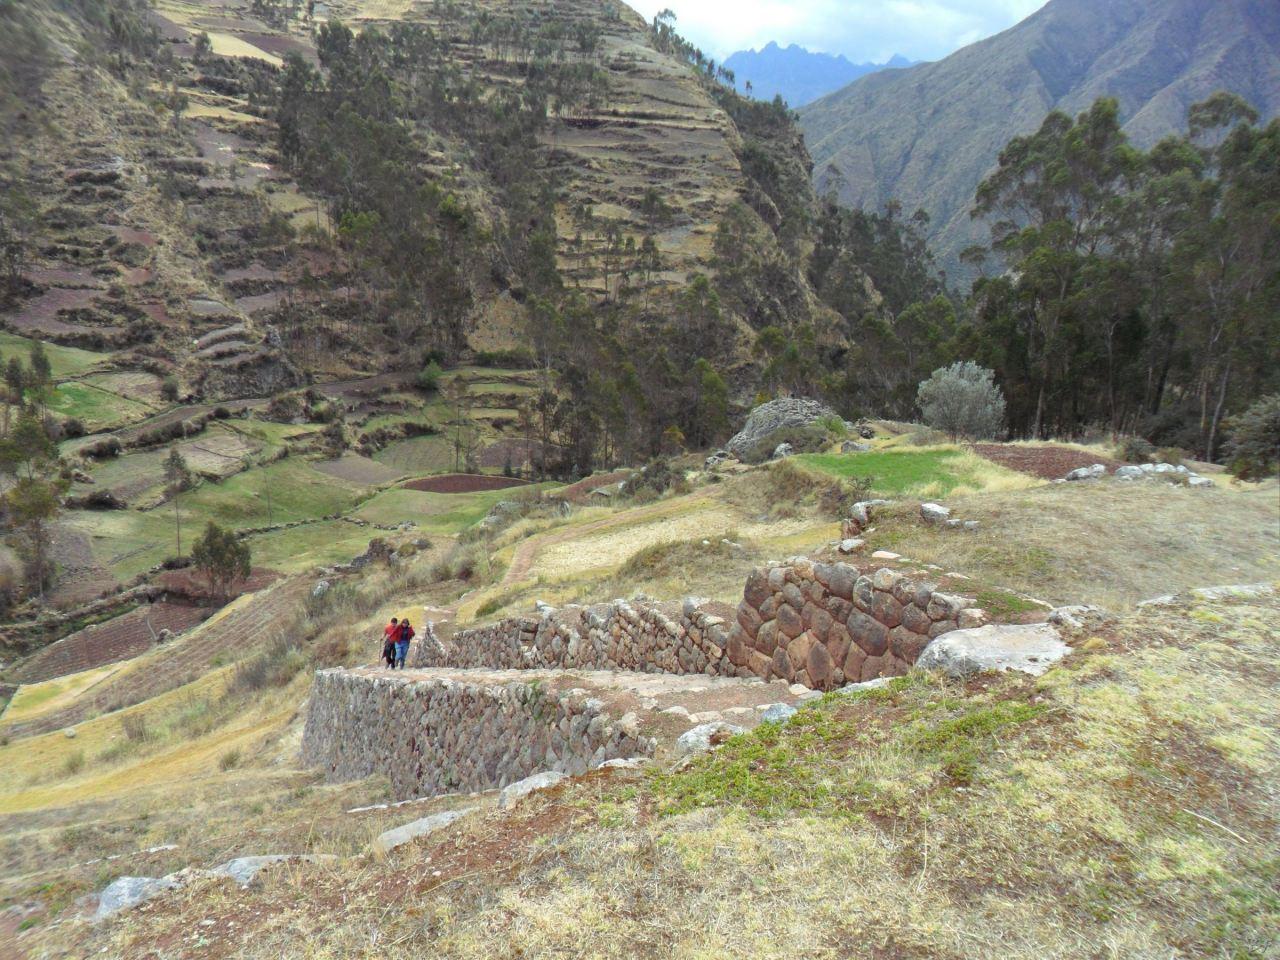 Chinchero-Mura-Poligonali-Piramide-Urubamba-Peru-64